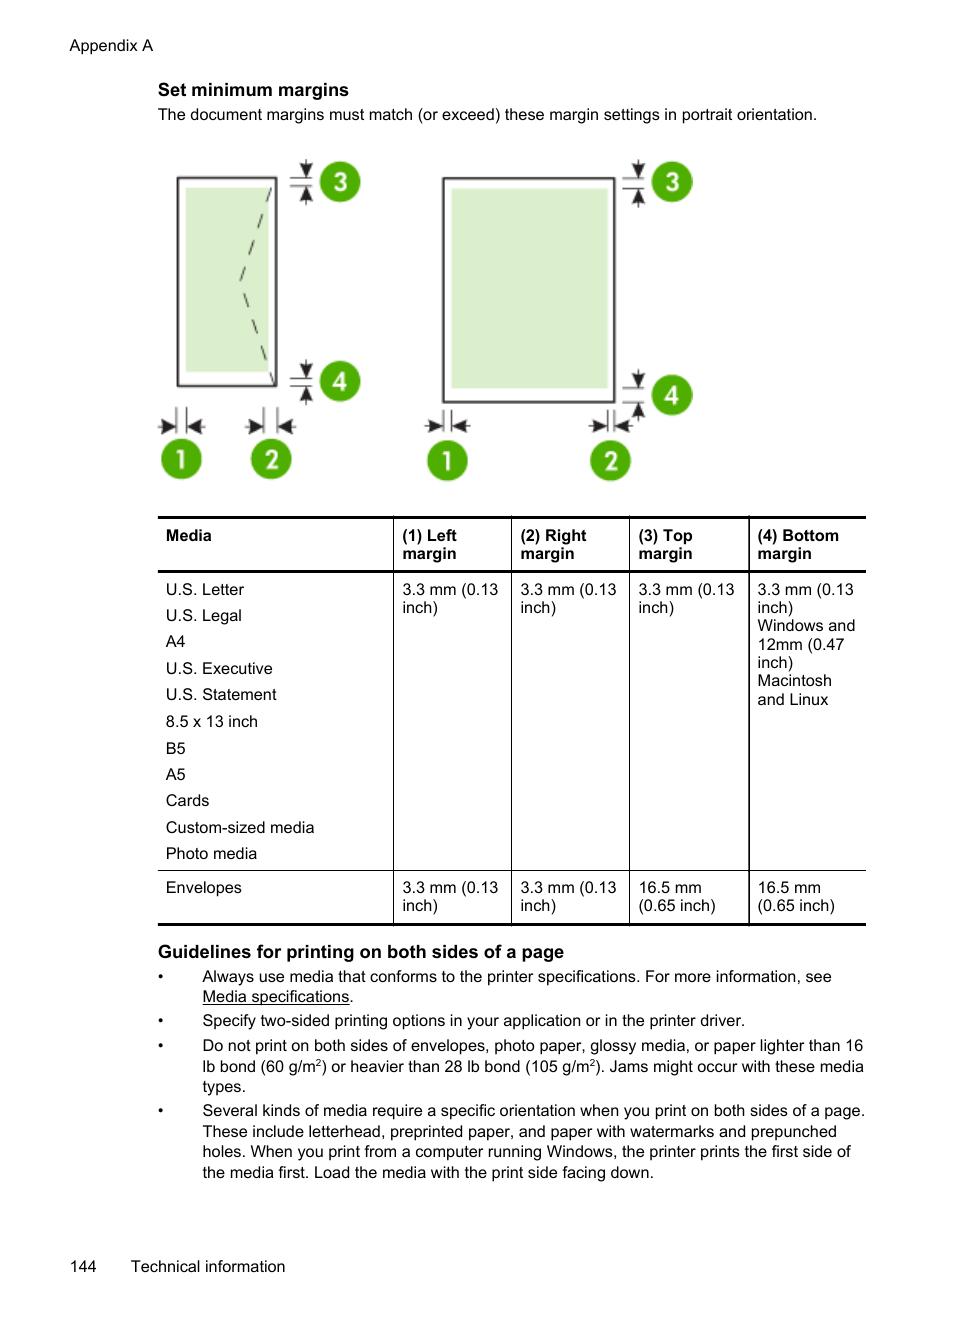 Set minimum margins | HP Officejet 6700 Premium e-All-in-One Printer